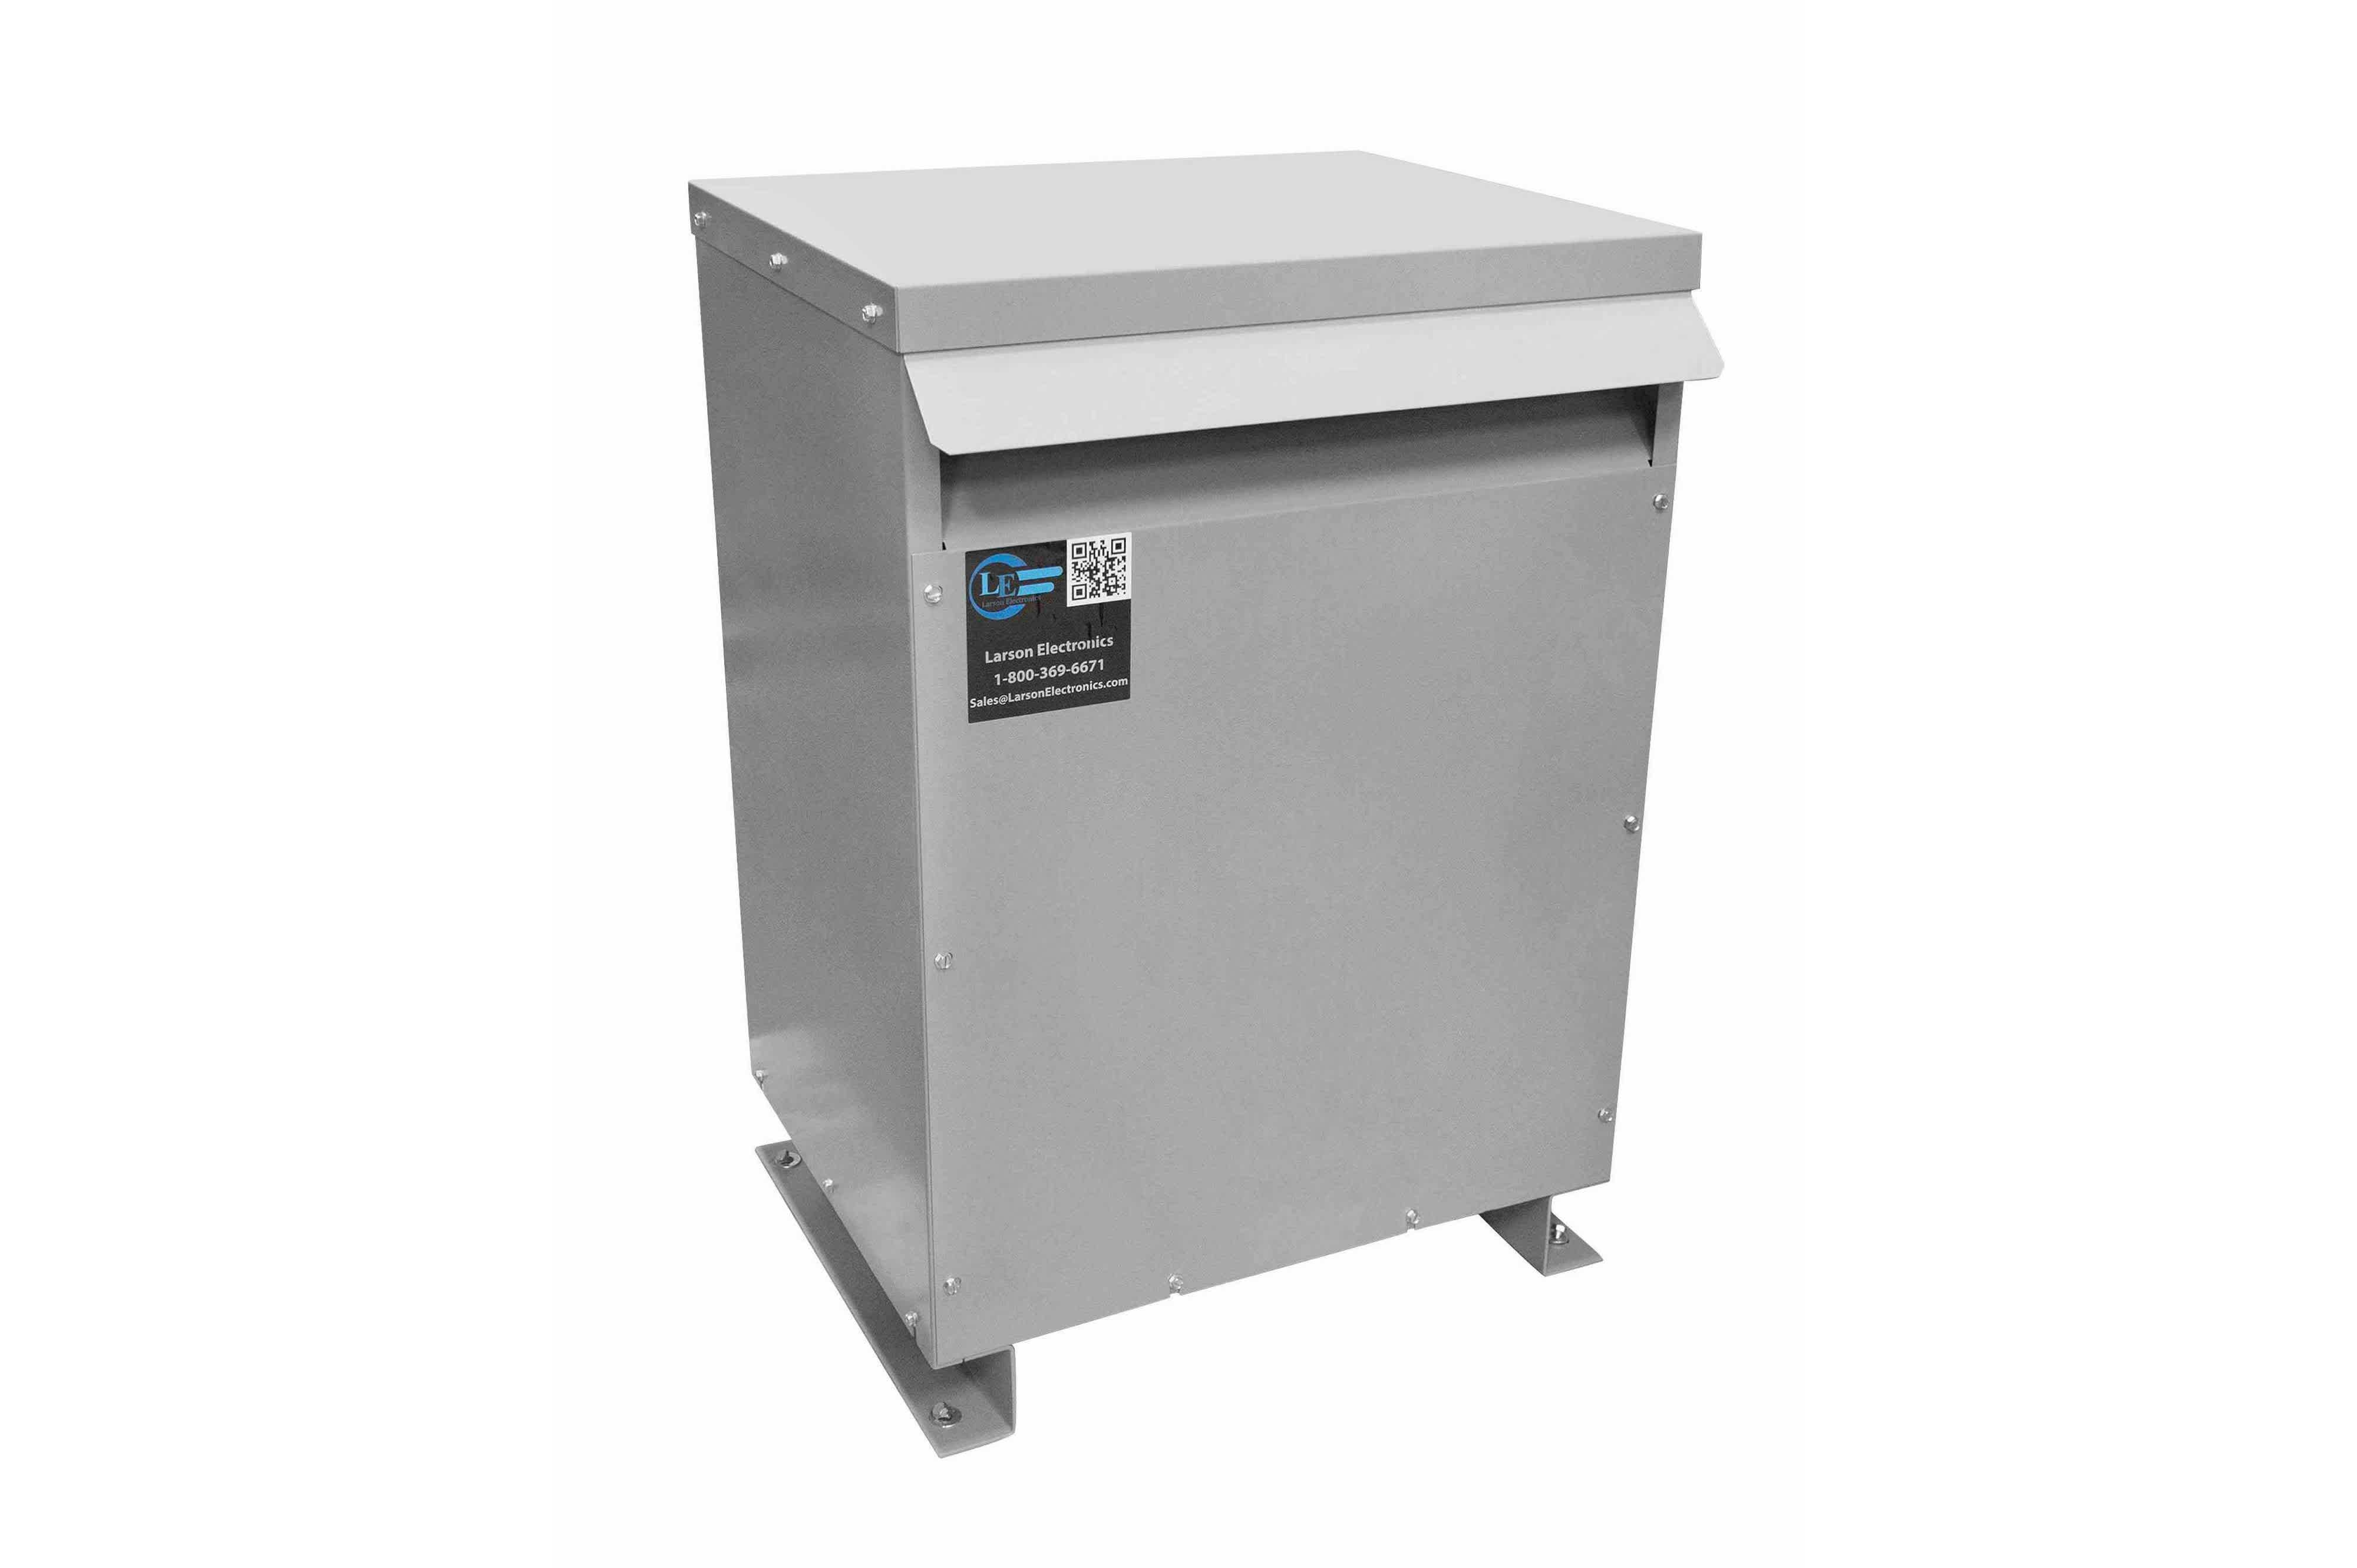 150 kVA 3PH Isolation Transformer, 240V Wye Primary, 415Y/240 Wye-N Secondary, N3R, Ventilated, 60 Hz